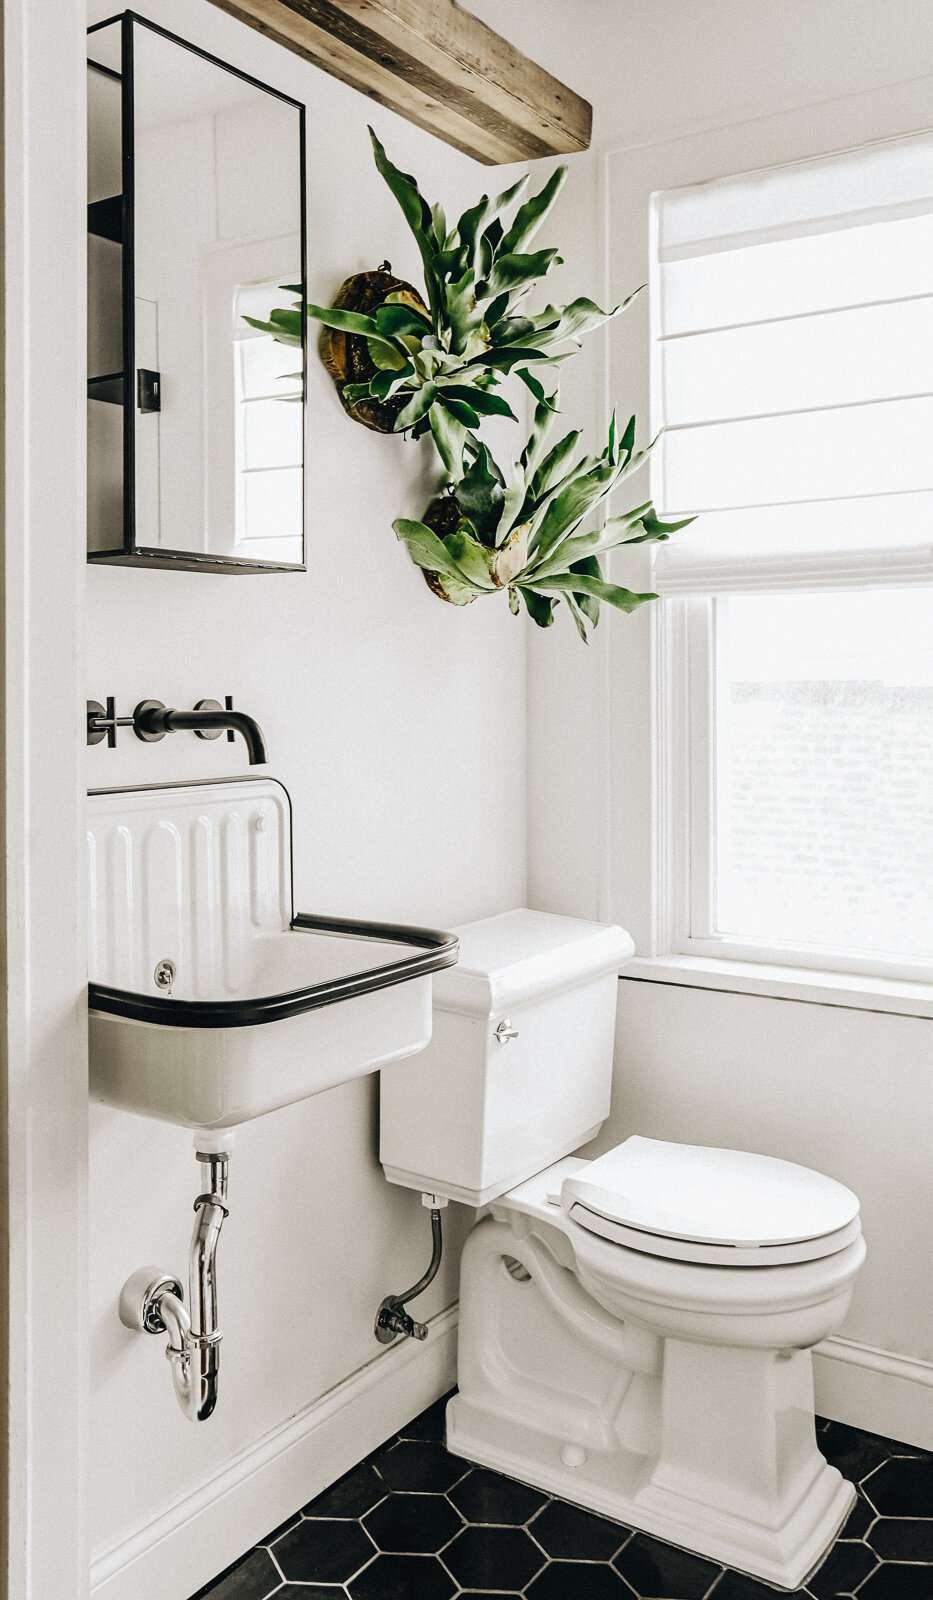 Modern farmhouse bathroom with black hexagonal tile, live hanging plant